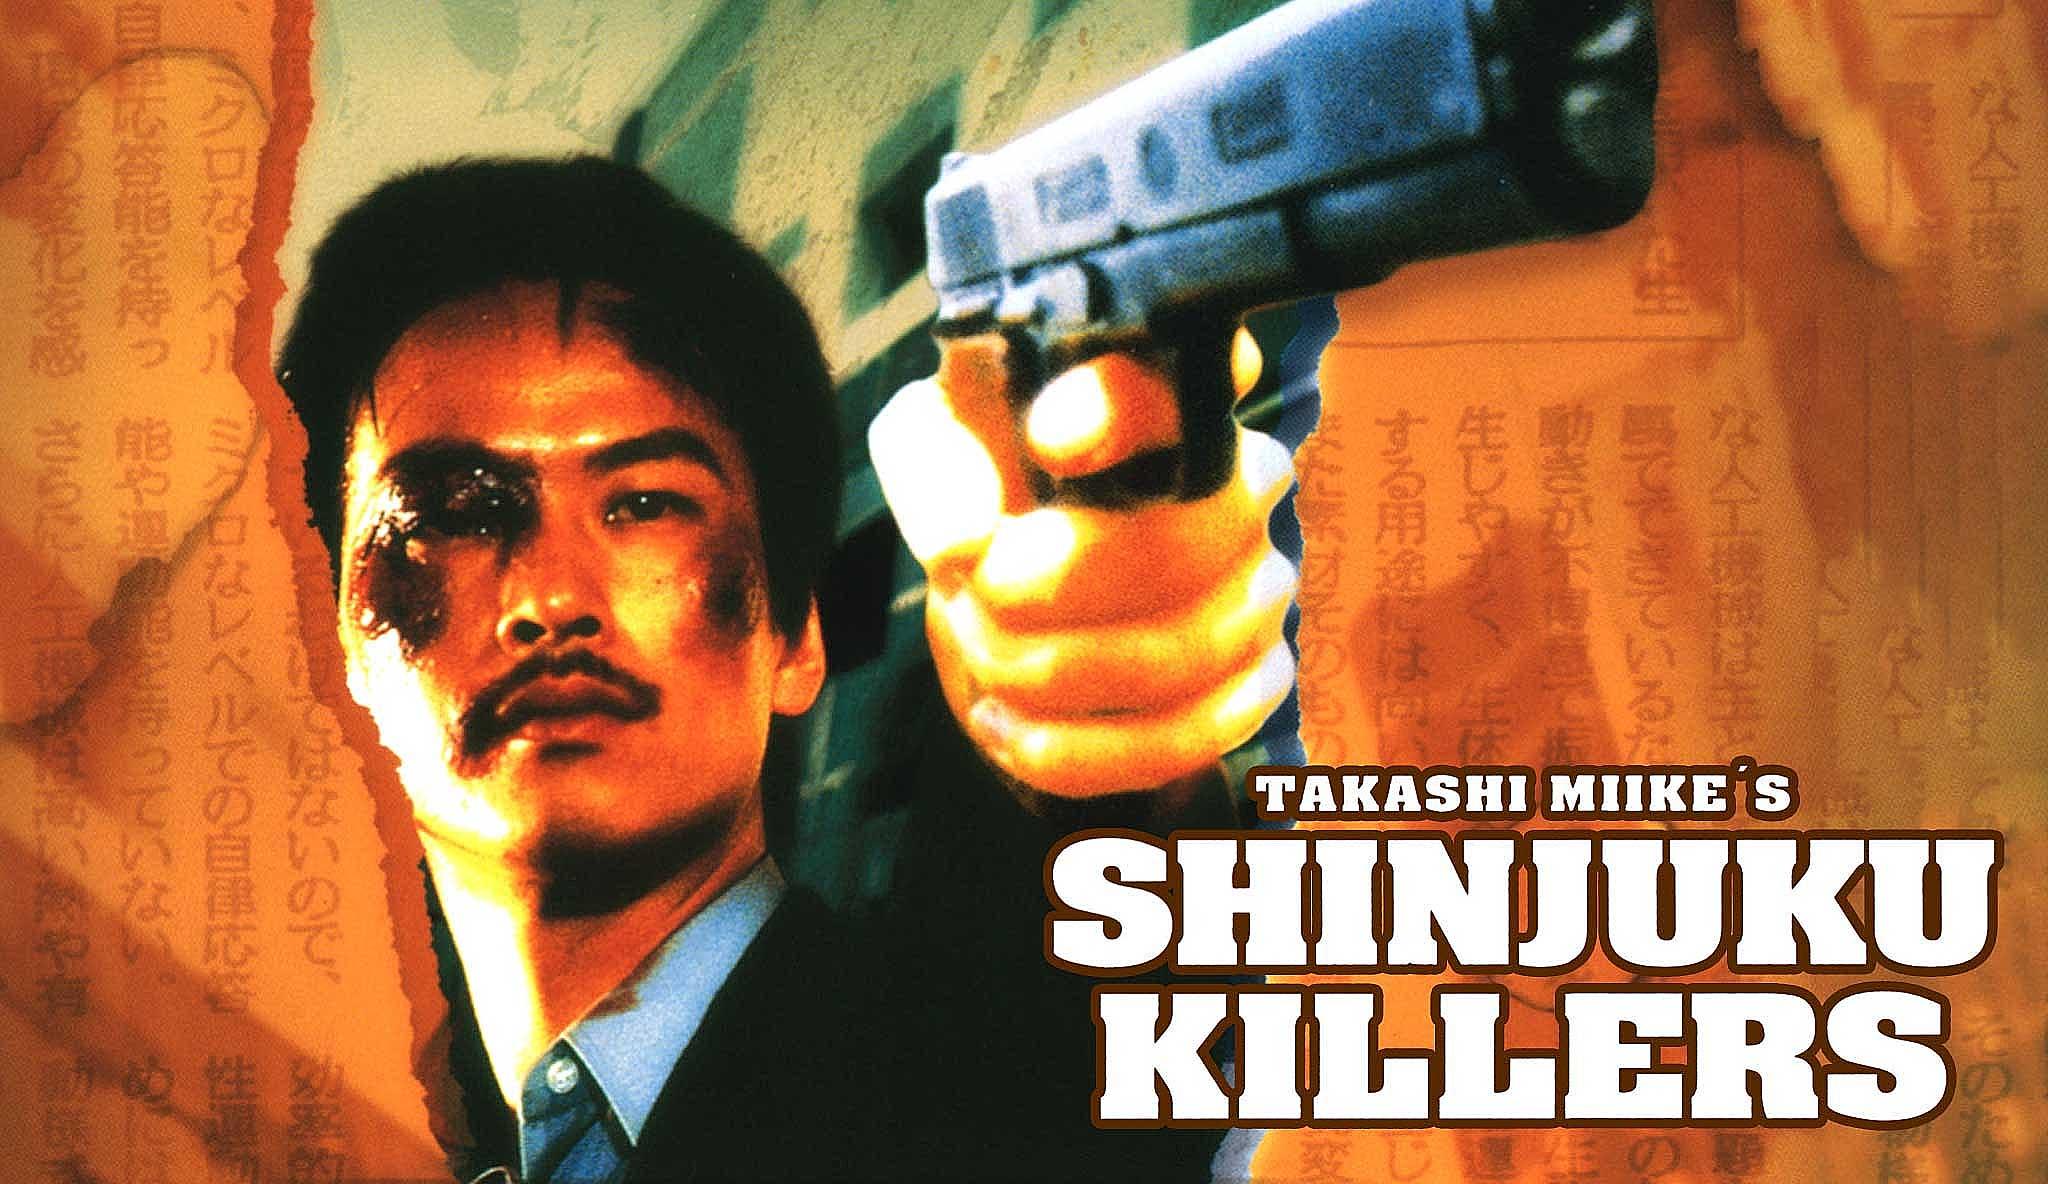 shinjuku-killers\header.jpg